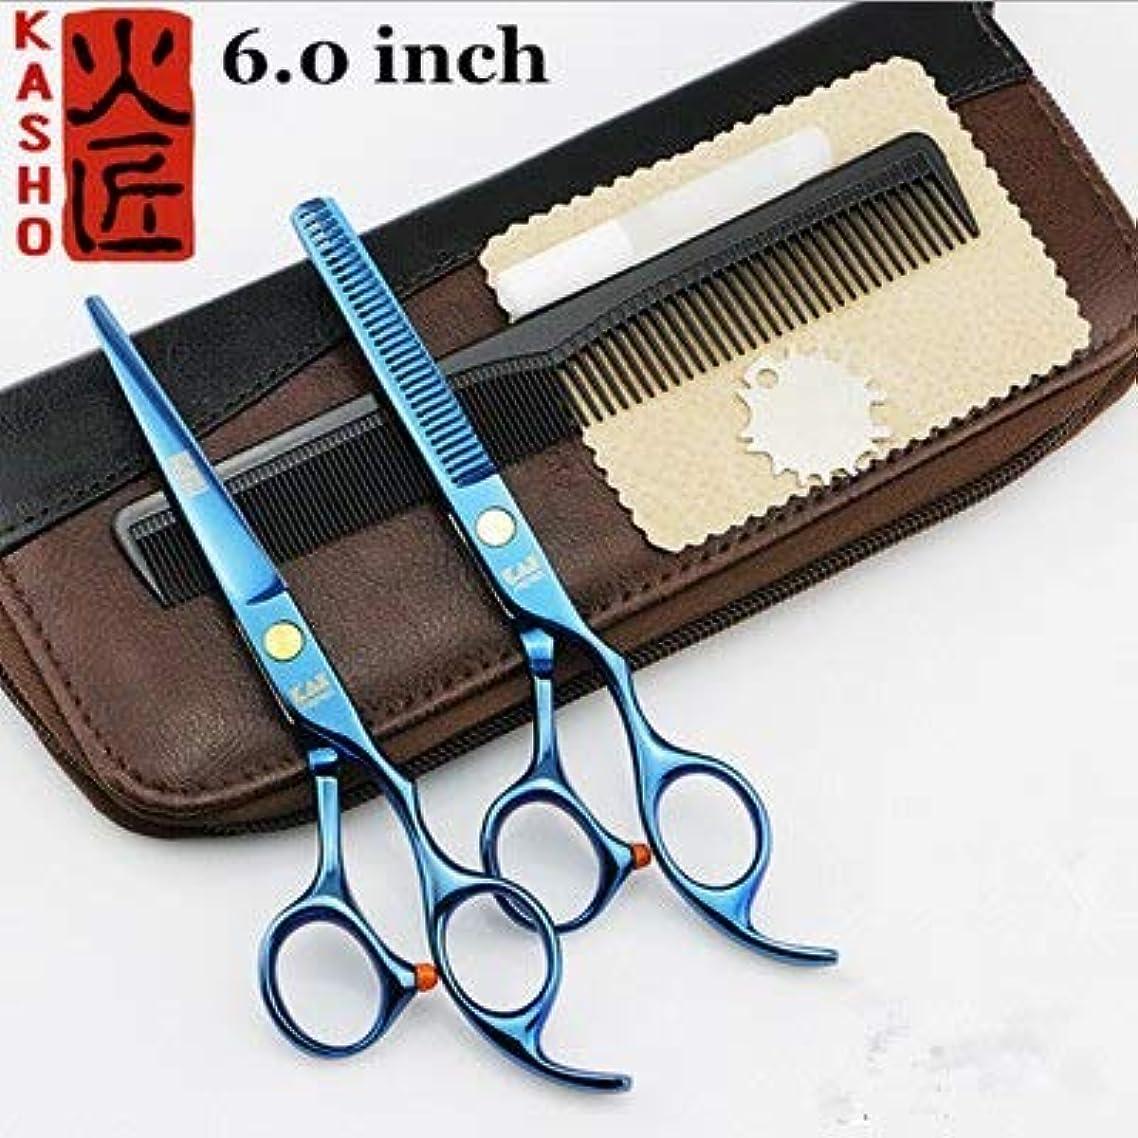 1 Set 2 Scissors+1 bag Kasho 5.5/6 Inch Professional Hairdressing Scissors Hair Cutting Barber Shears Sets Thinning Salon